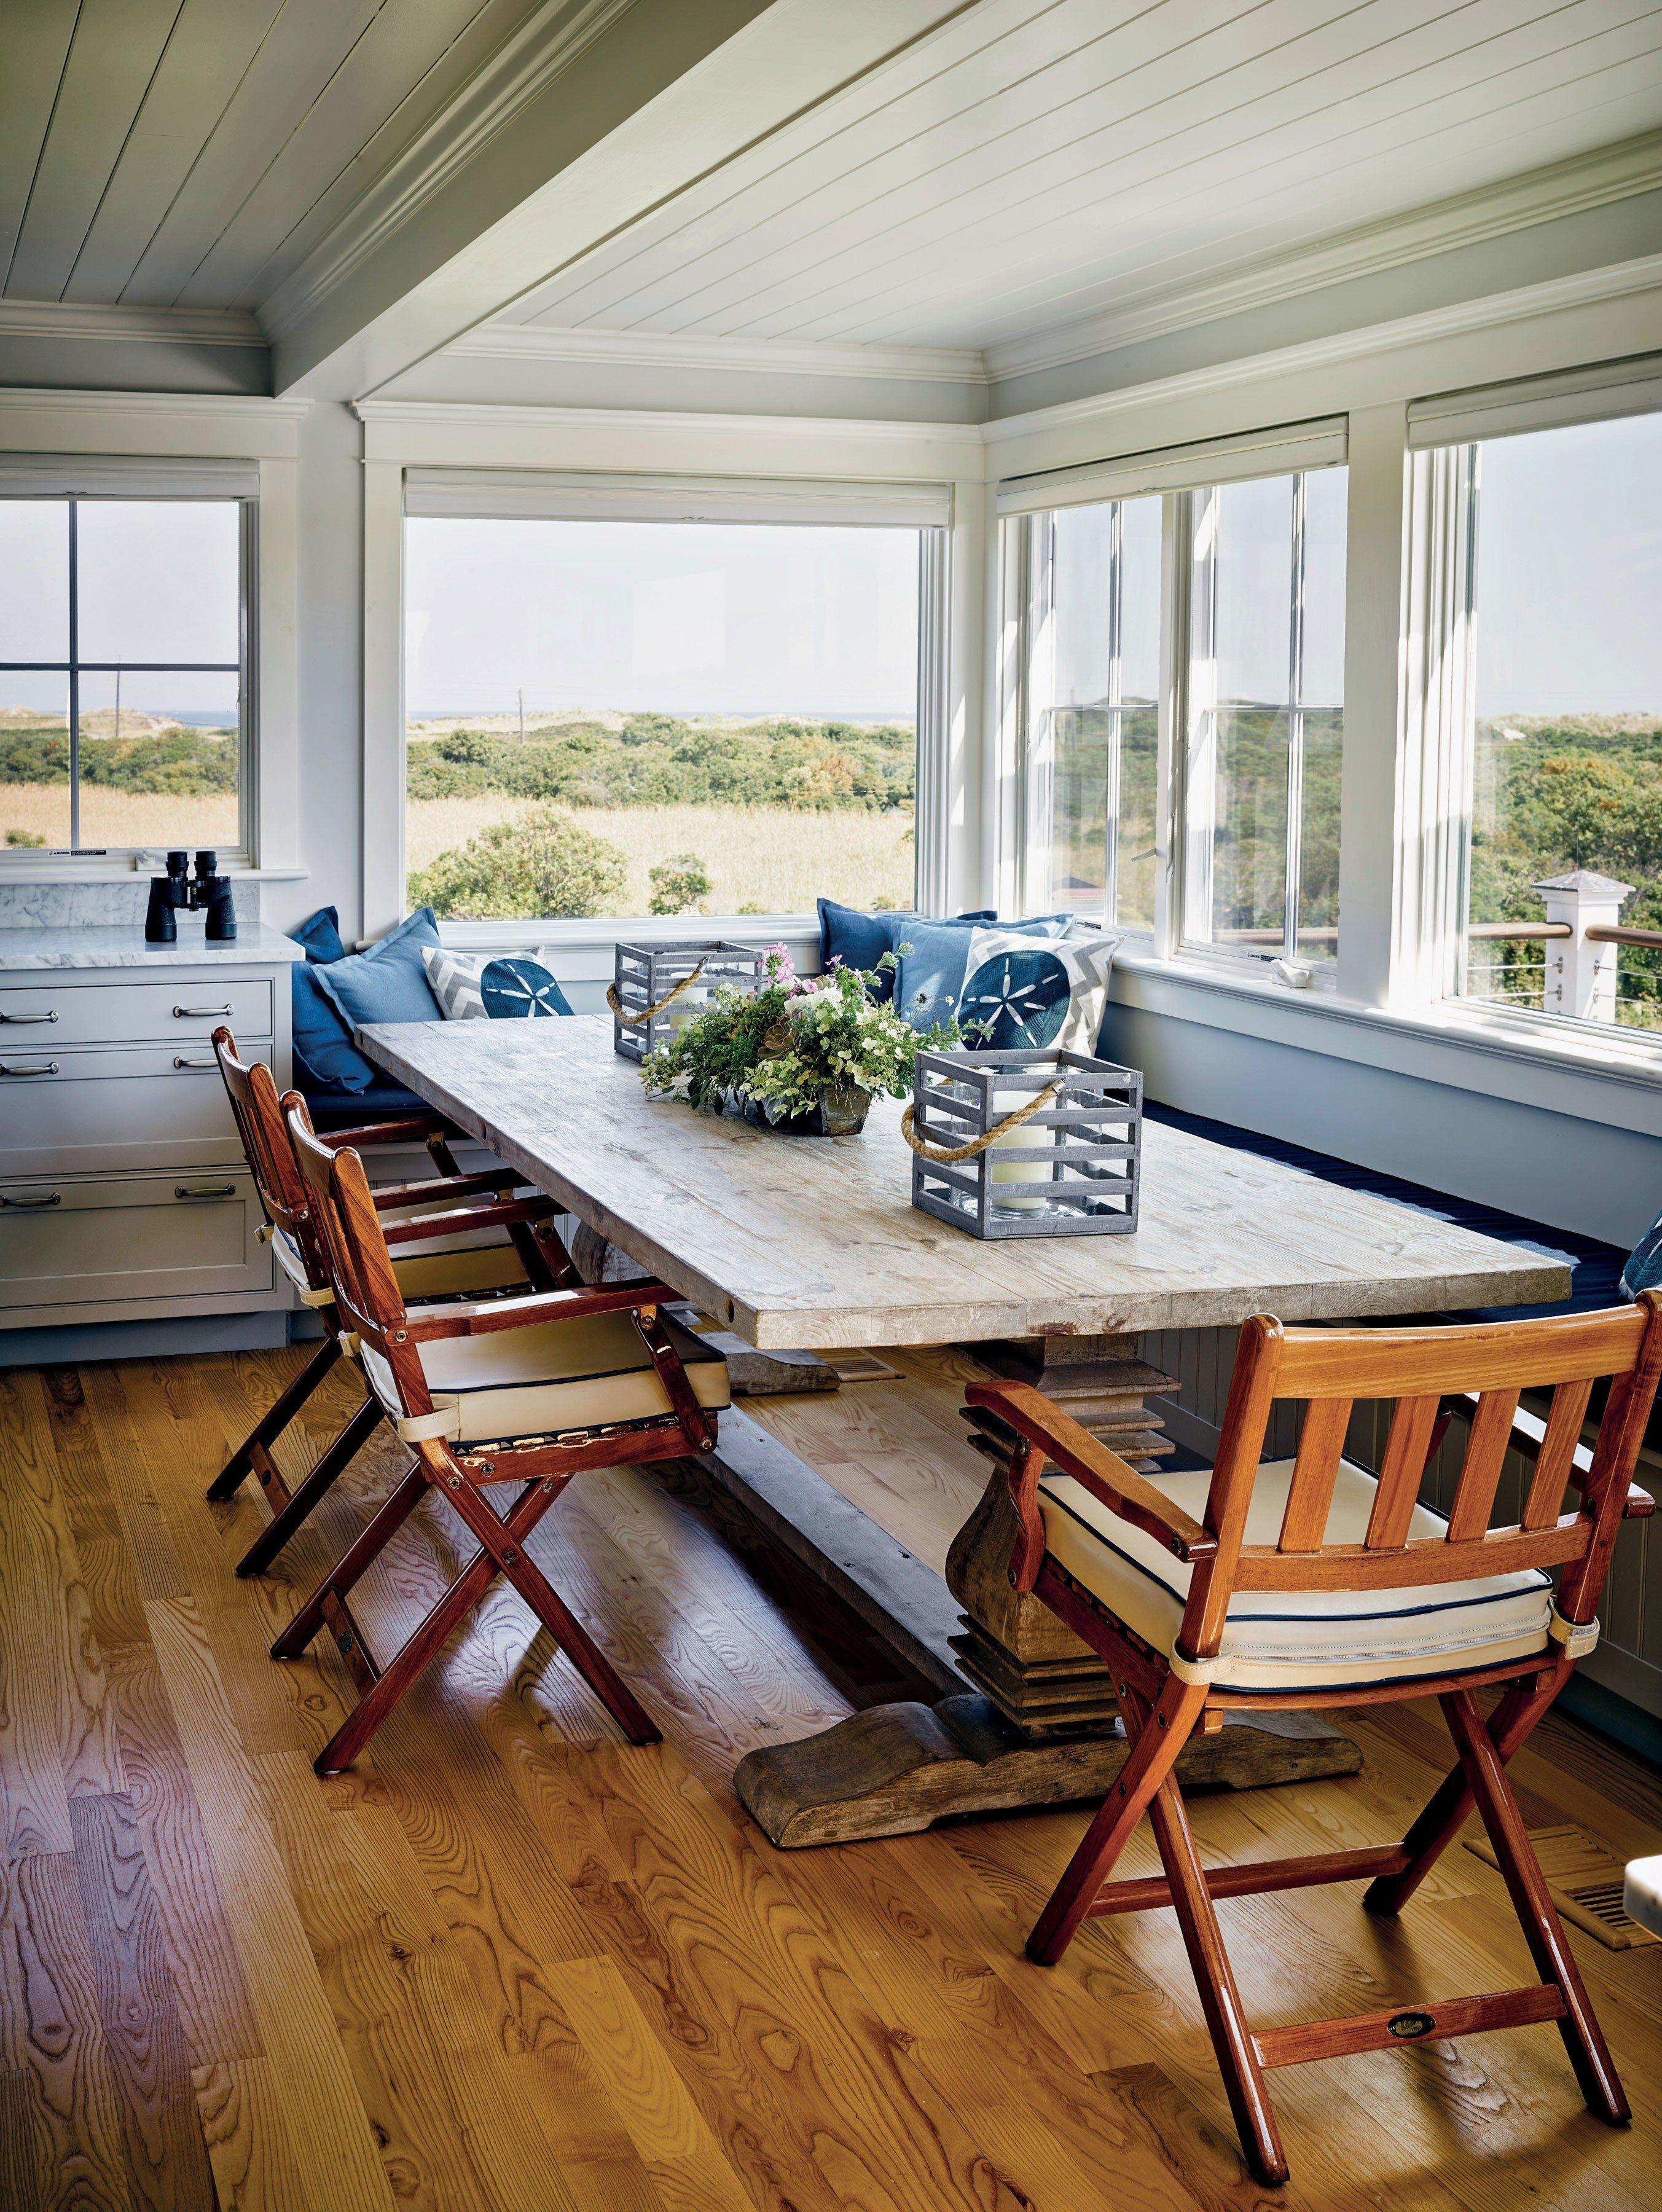 5 Design Ideas For A Quintessential Beach House Photos Architectural Digest